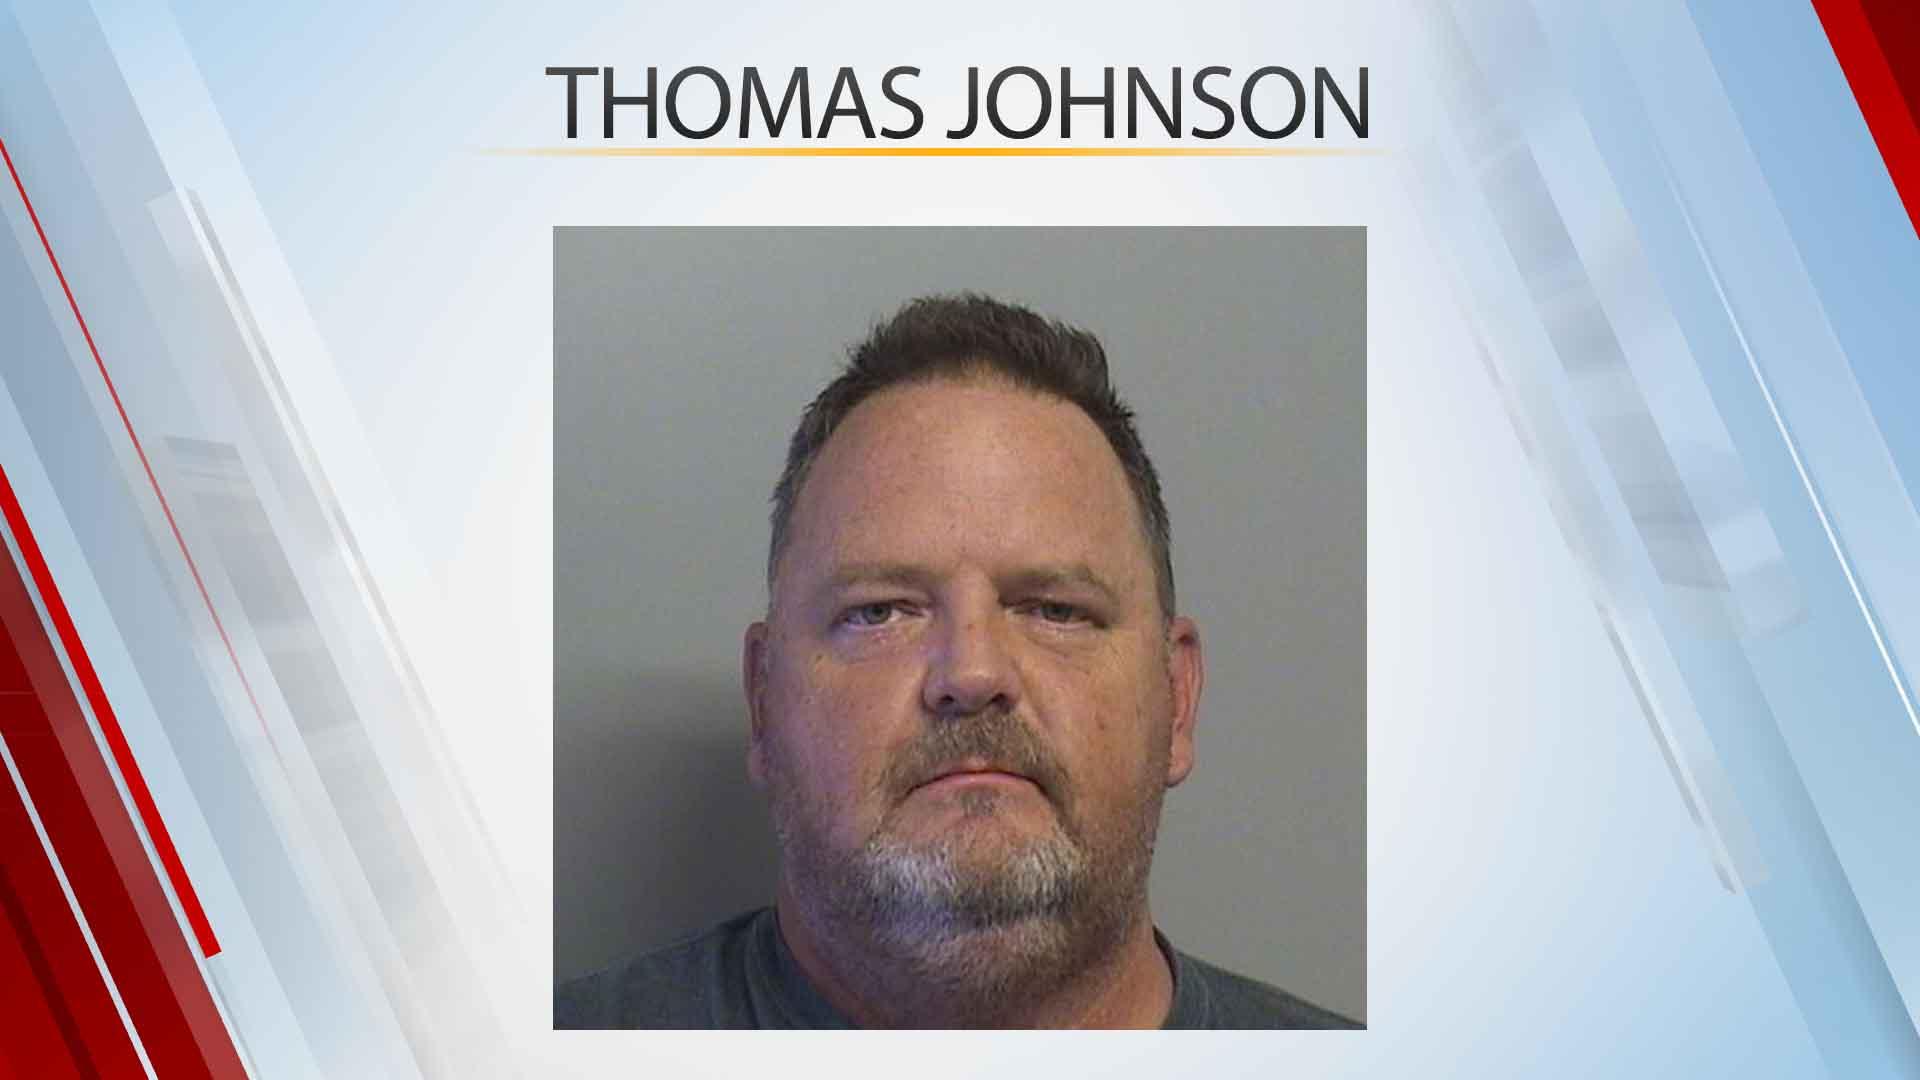 Booking photo of Thomas Johnson